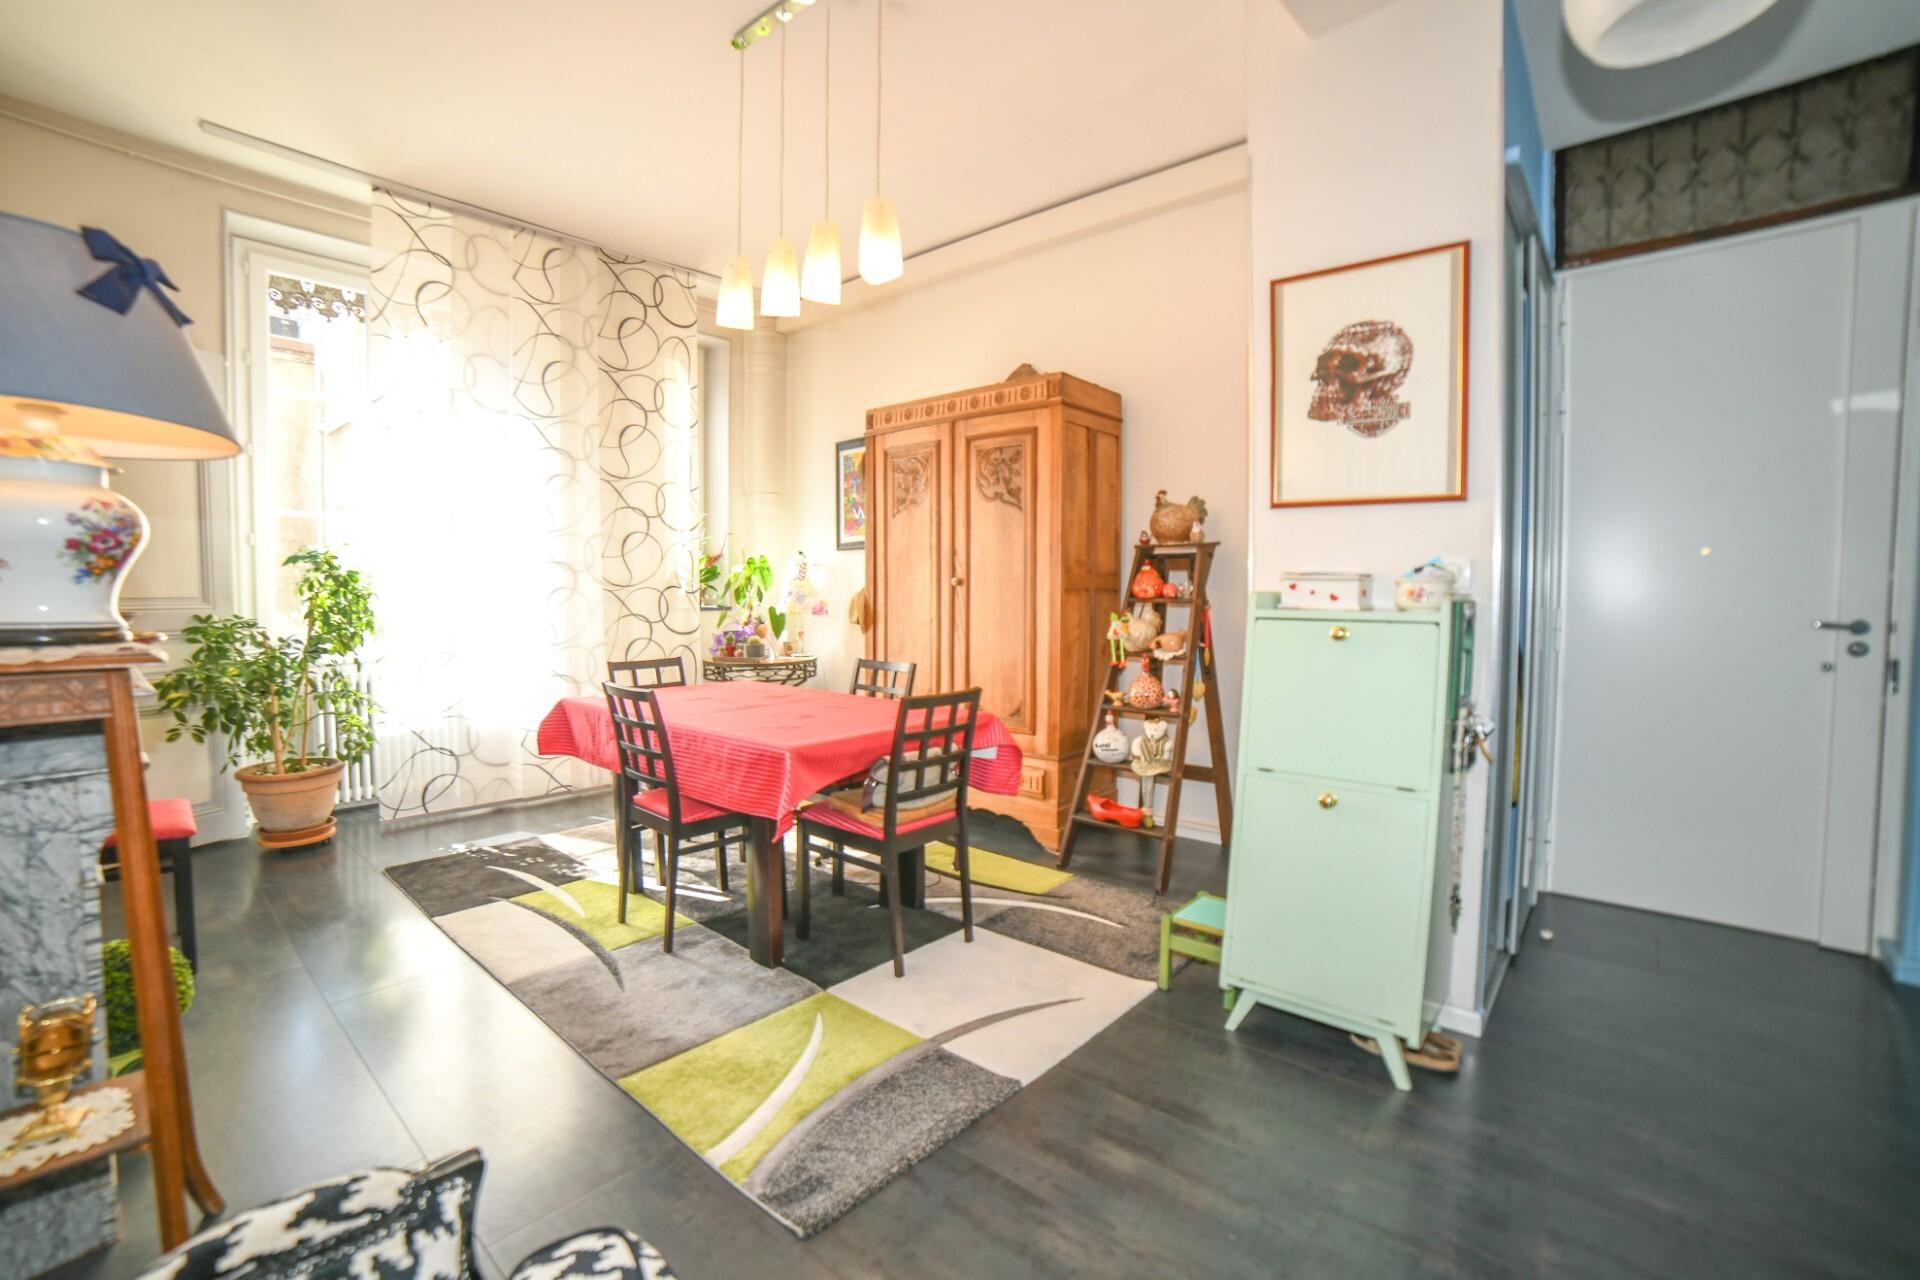 Vente appartement 3 pices Grenoble 38000  421889